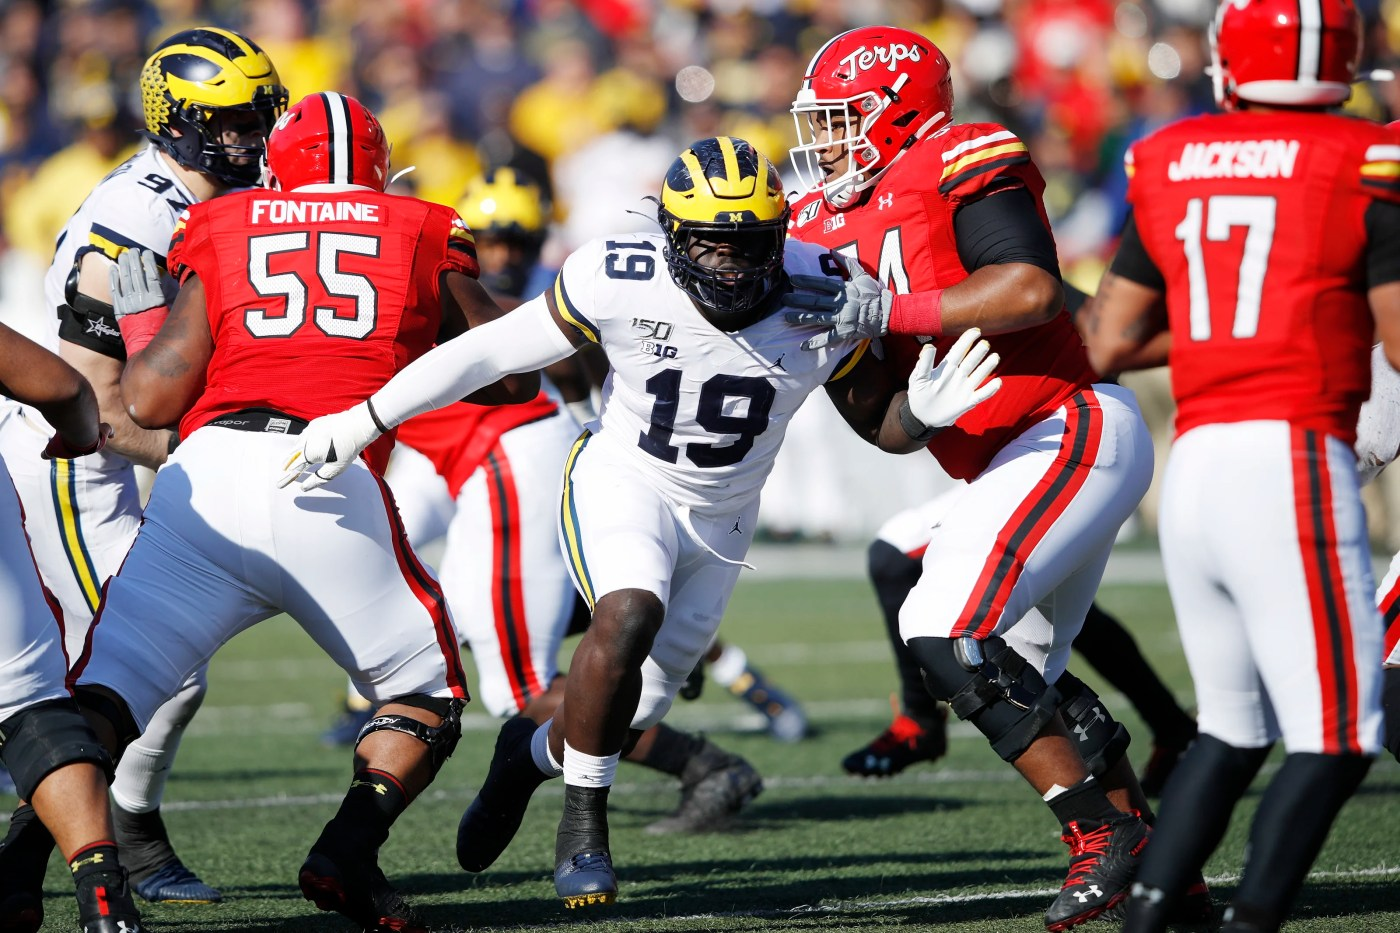 Michigan Football: Kwity Paye skyrocketing up 2021 NFL Draft boards - Page 2